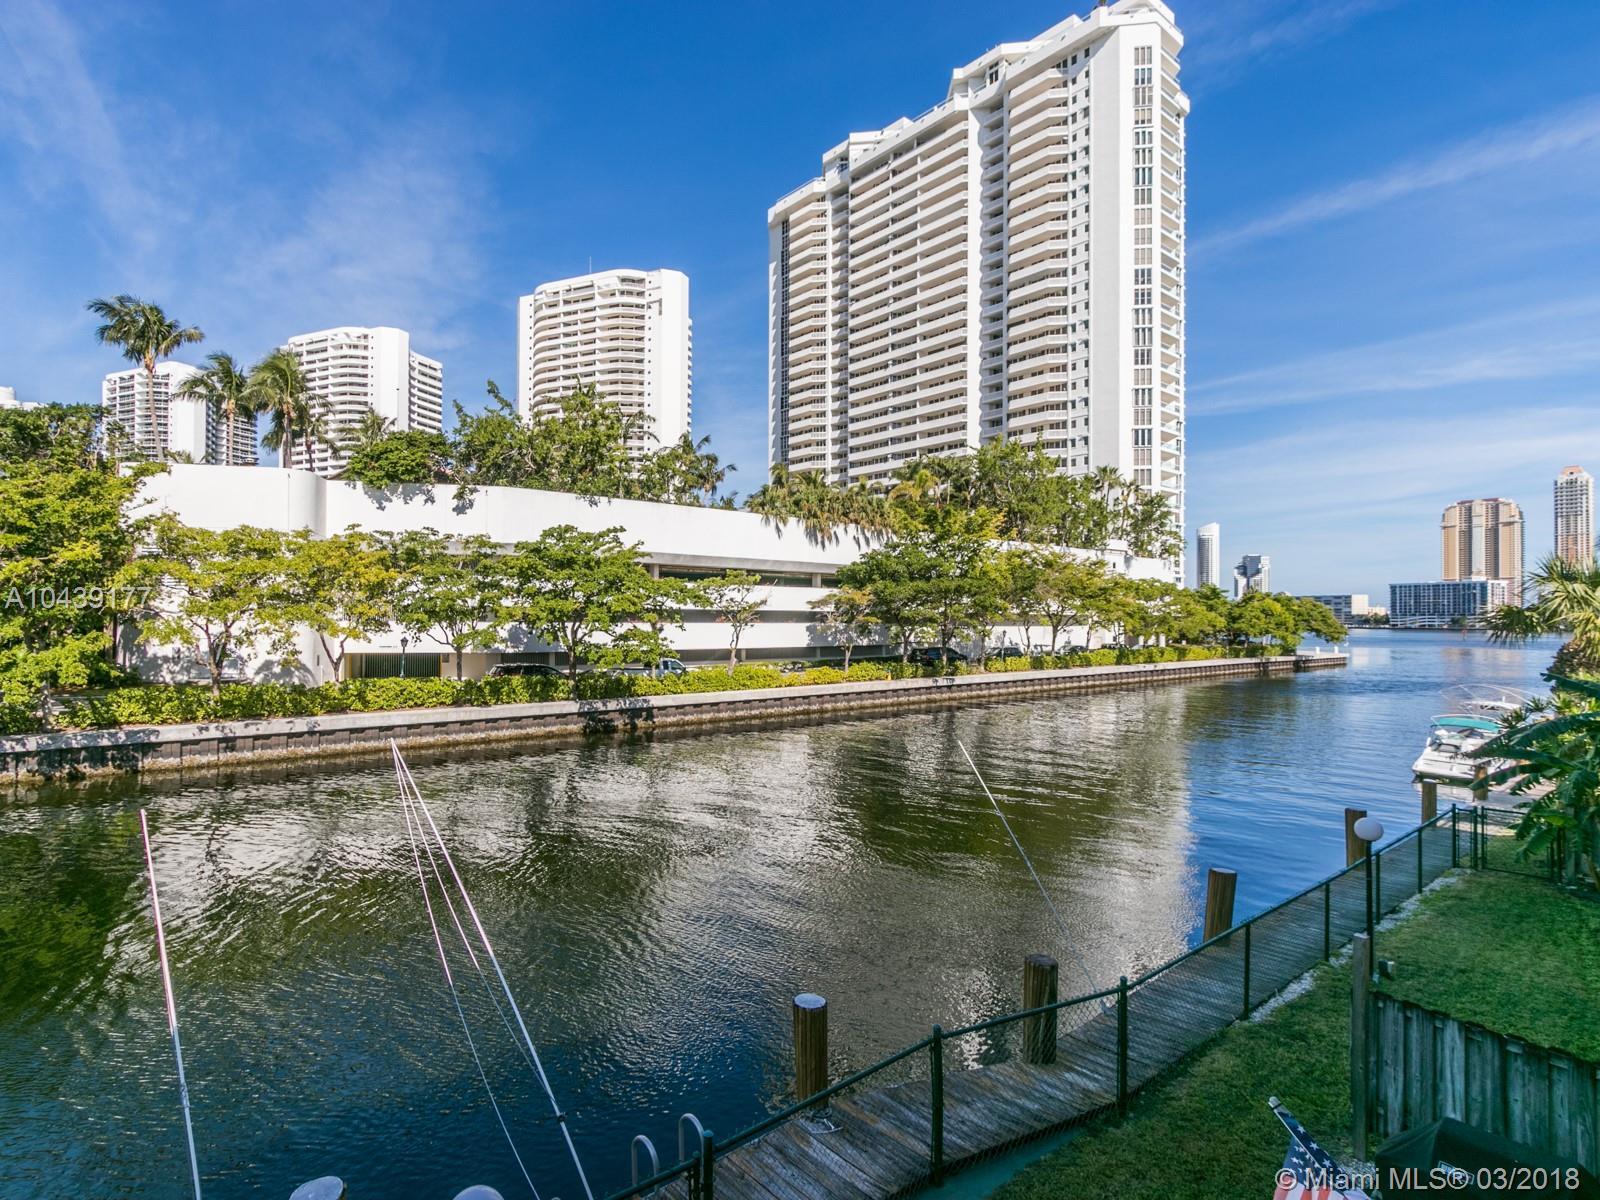 3745 NE 171 st #57, North Miami Beach FL 33160